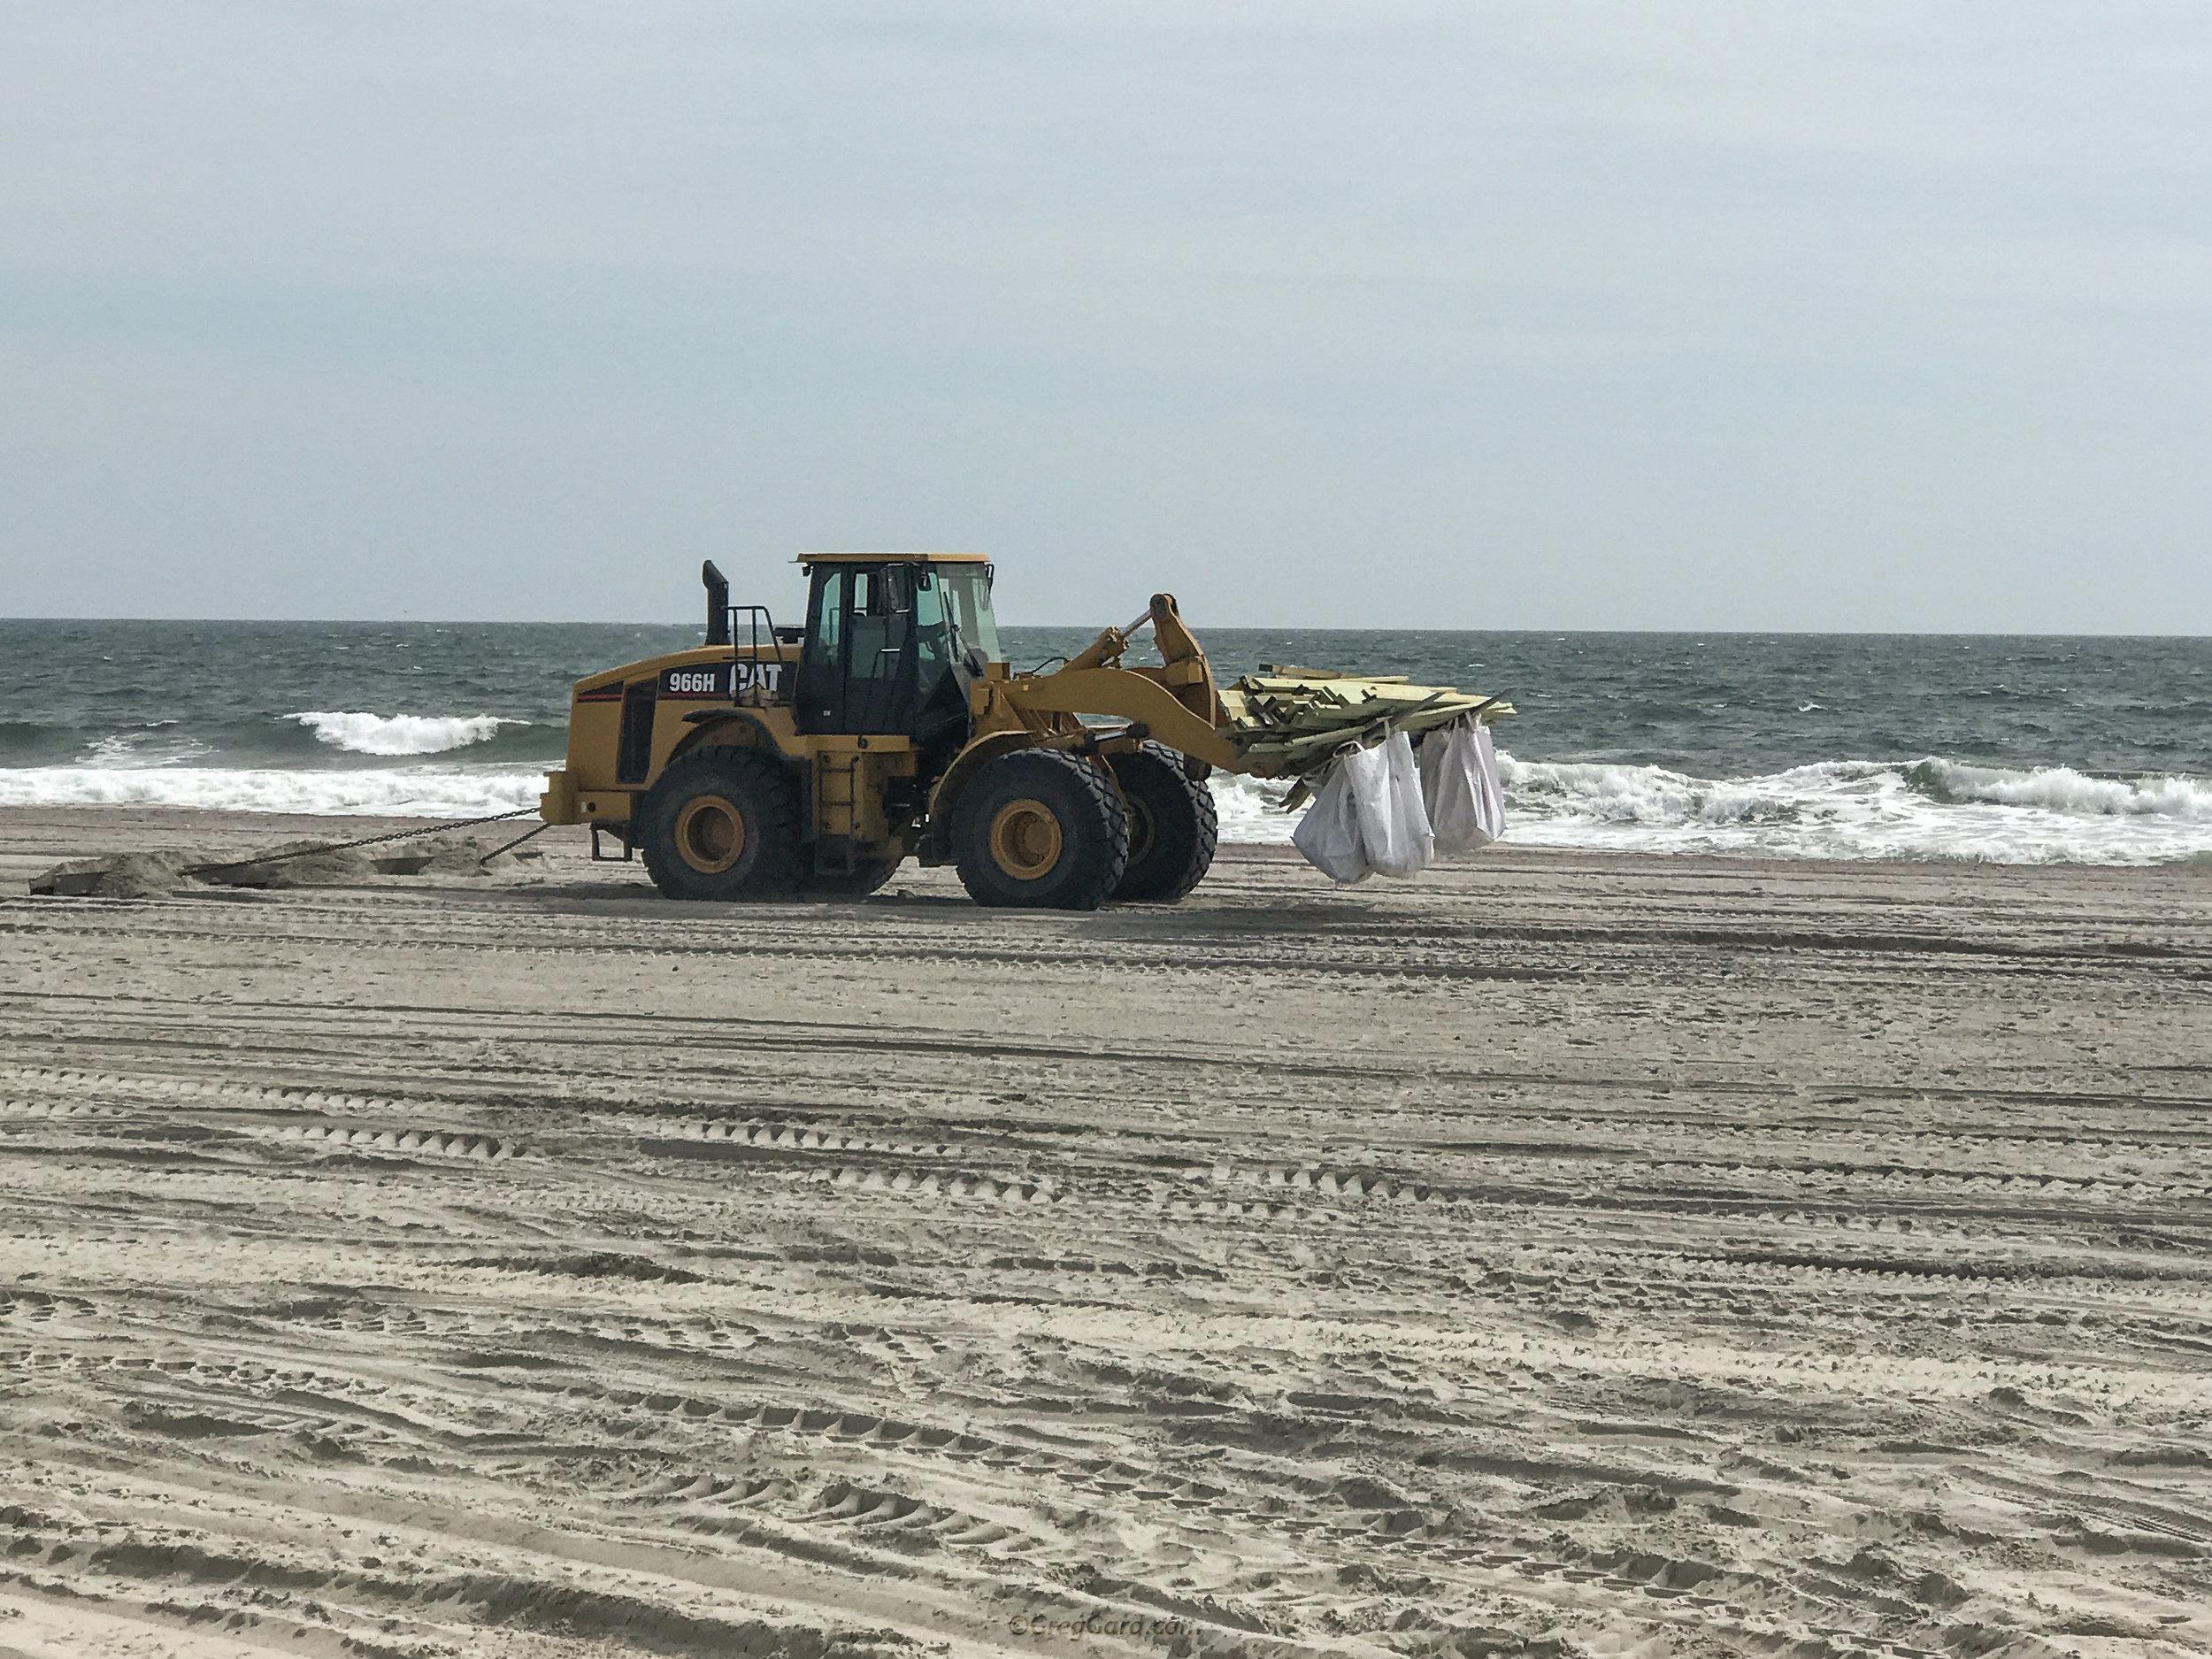 nickerson-beach-renovation-greg-gard-20190330-IMG_6686.jpg